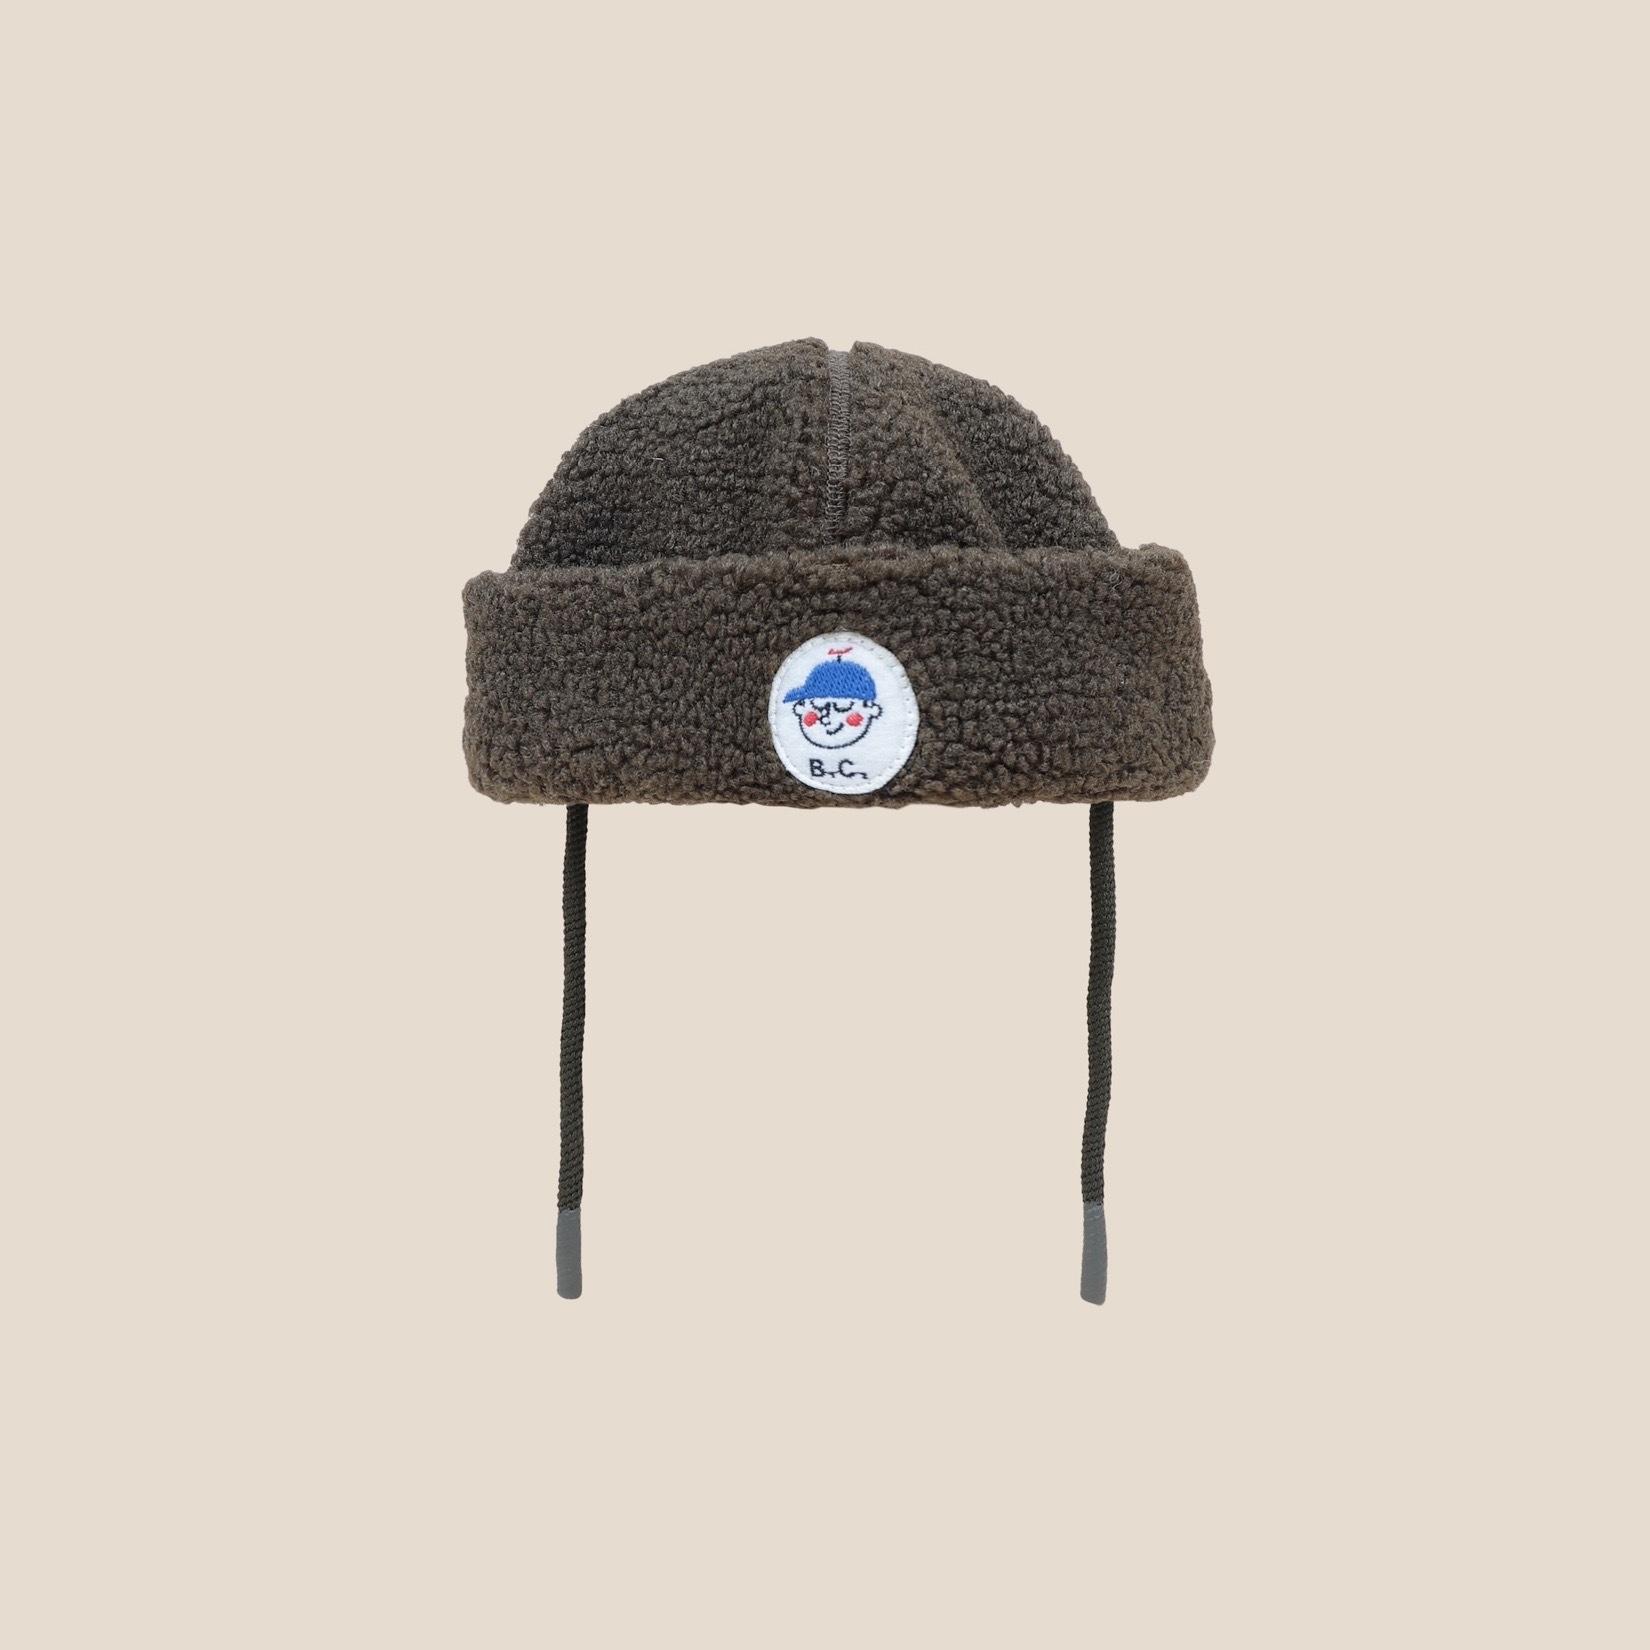 《BOBO CHOSES 2020AW》Boy Patch Sheepskin Hat / baby